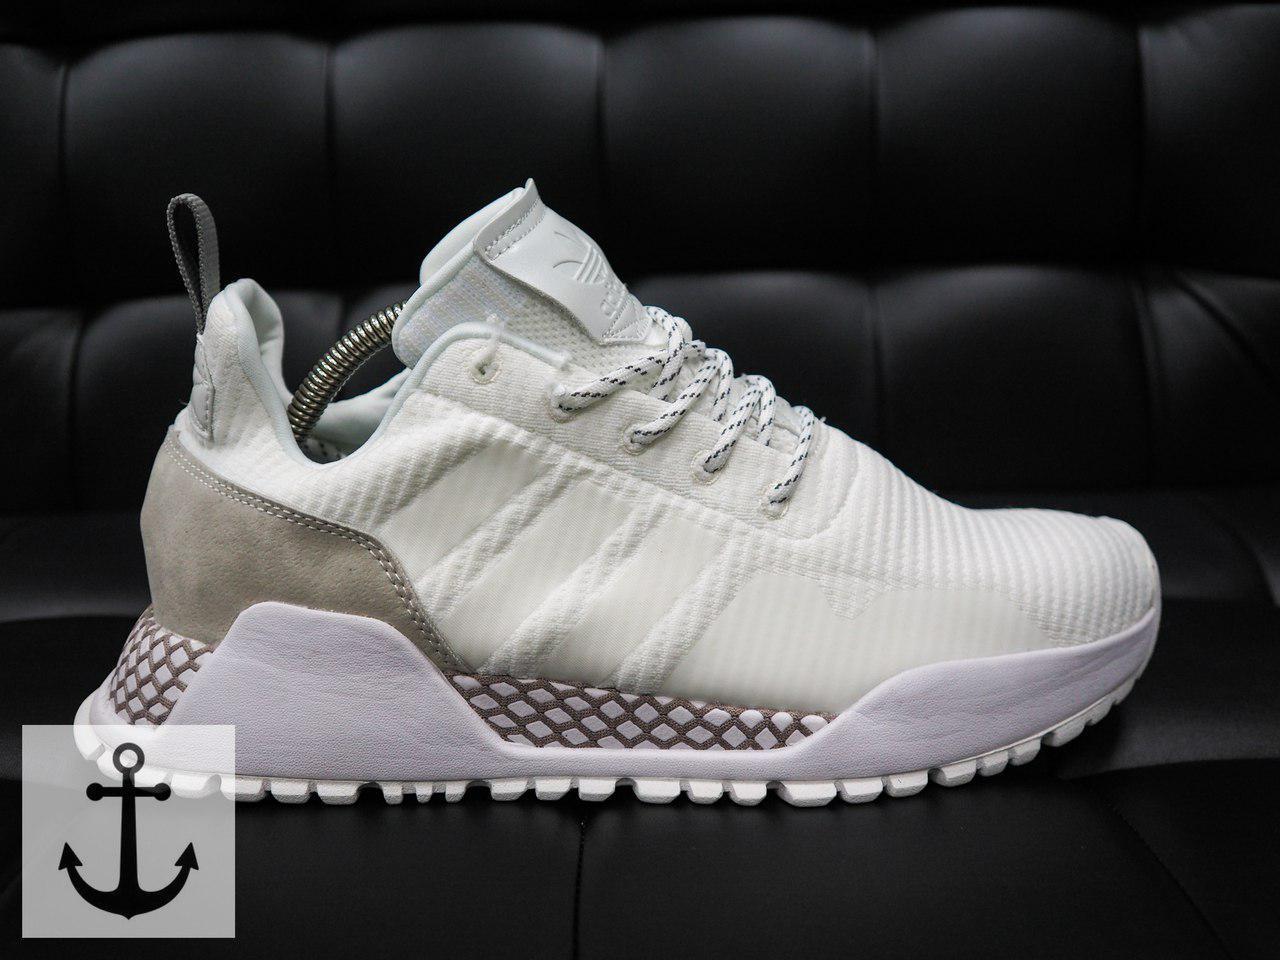 7e5b09e1234621 Мужские кроссовки Adidas Originals F/1.4 Primeknit Реплика - PoMode в Киеве